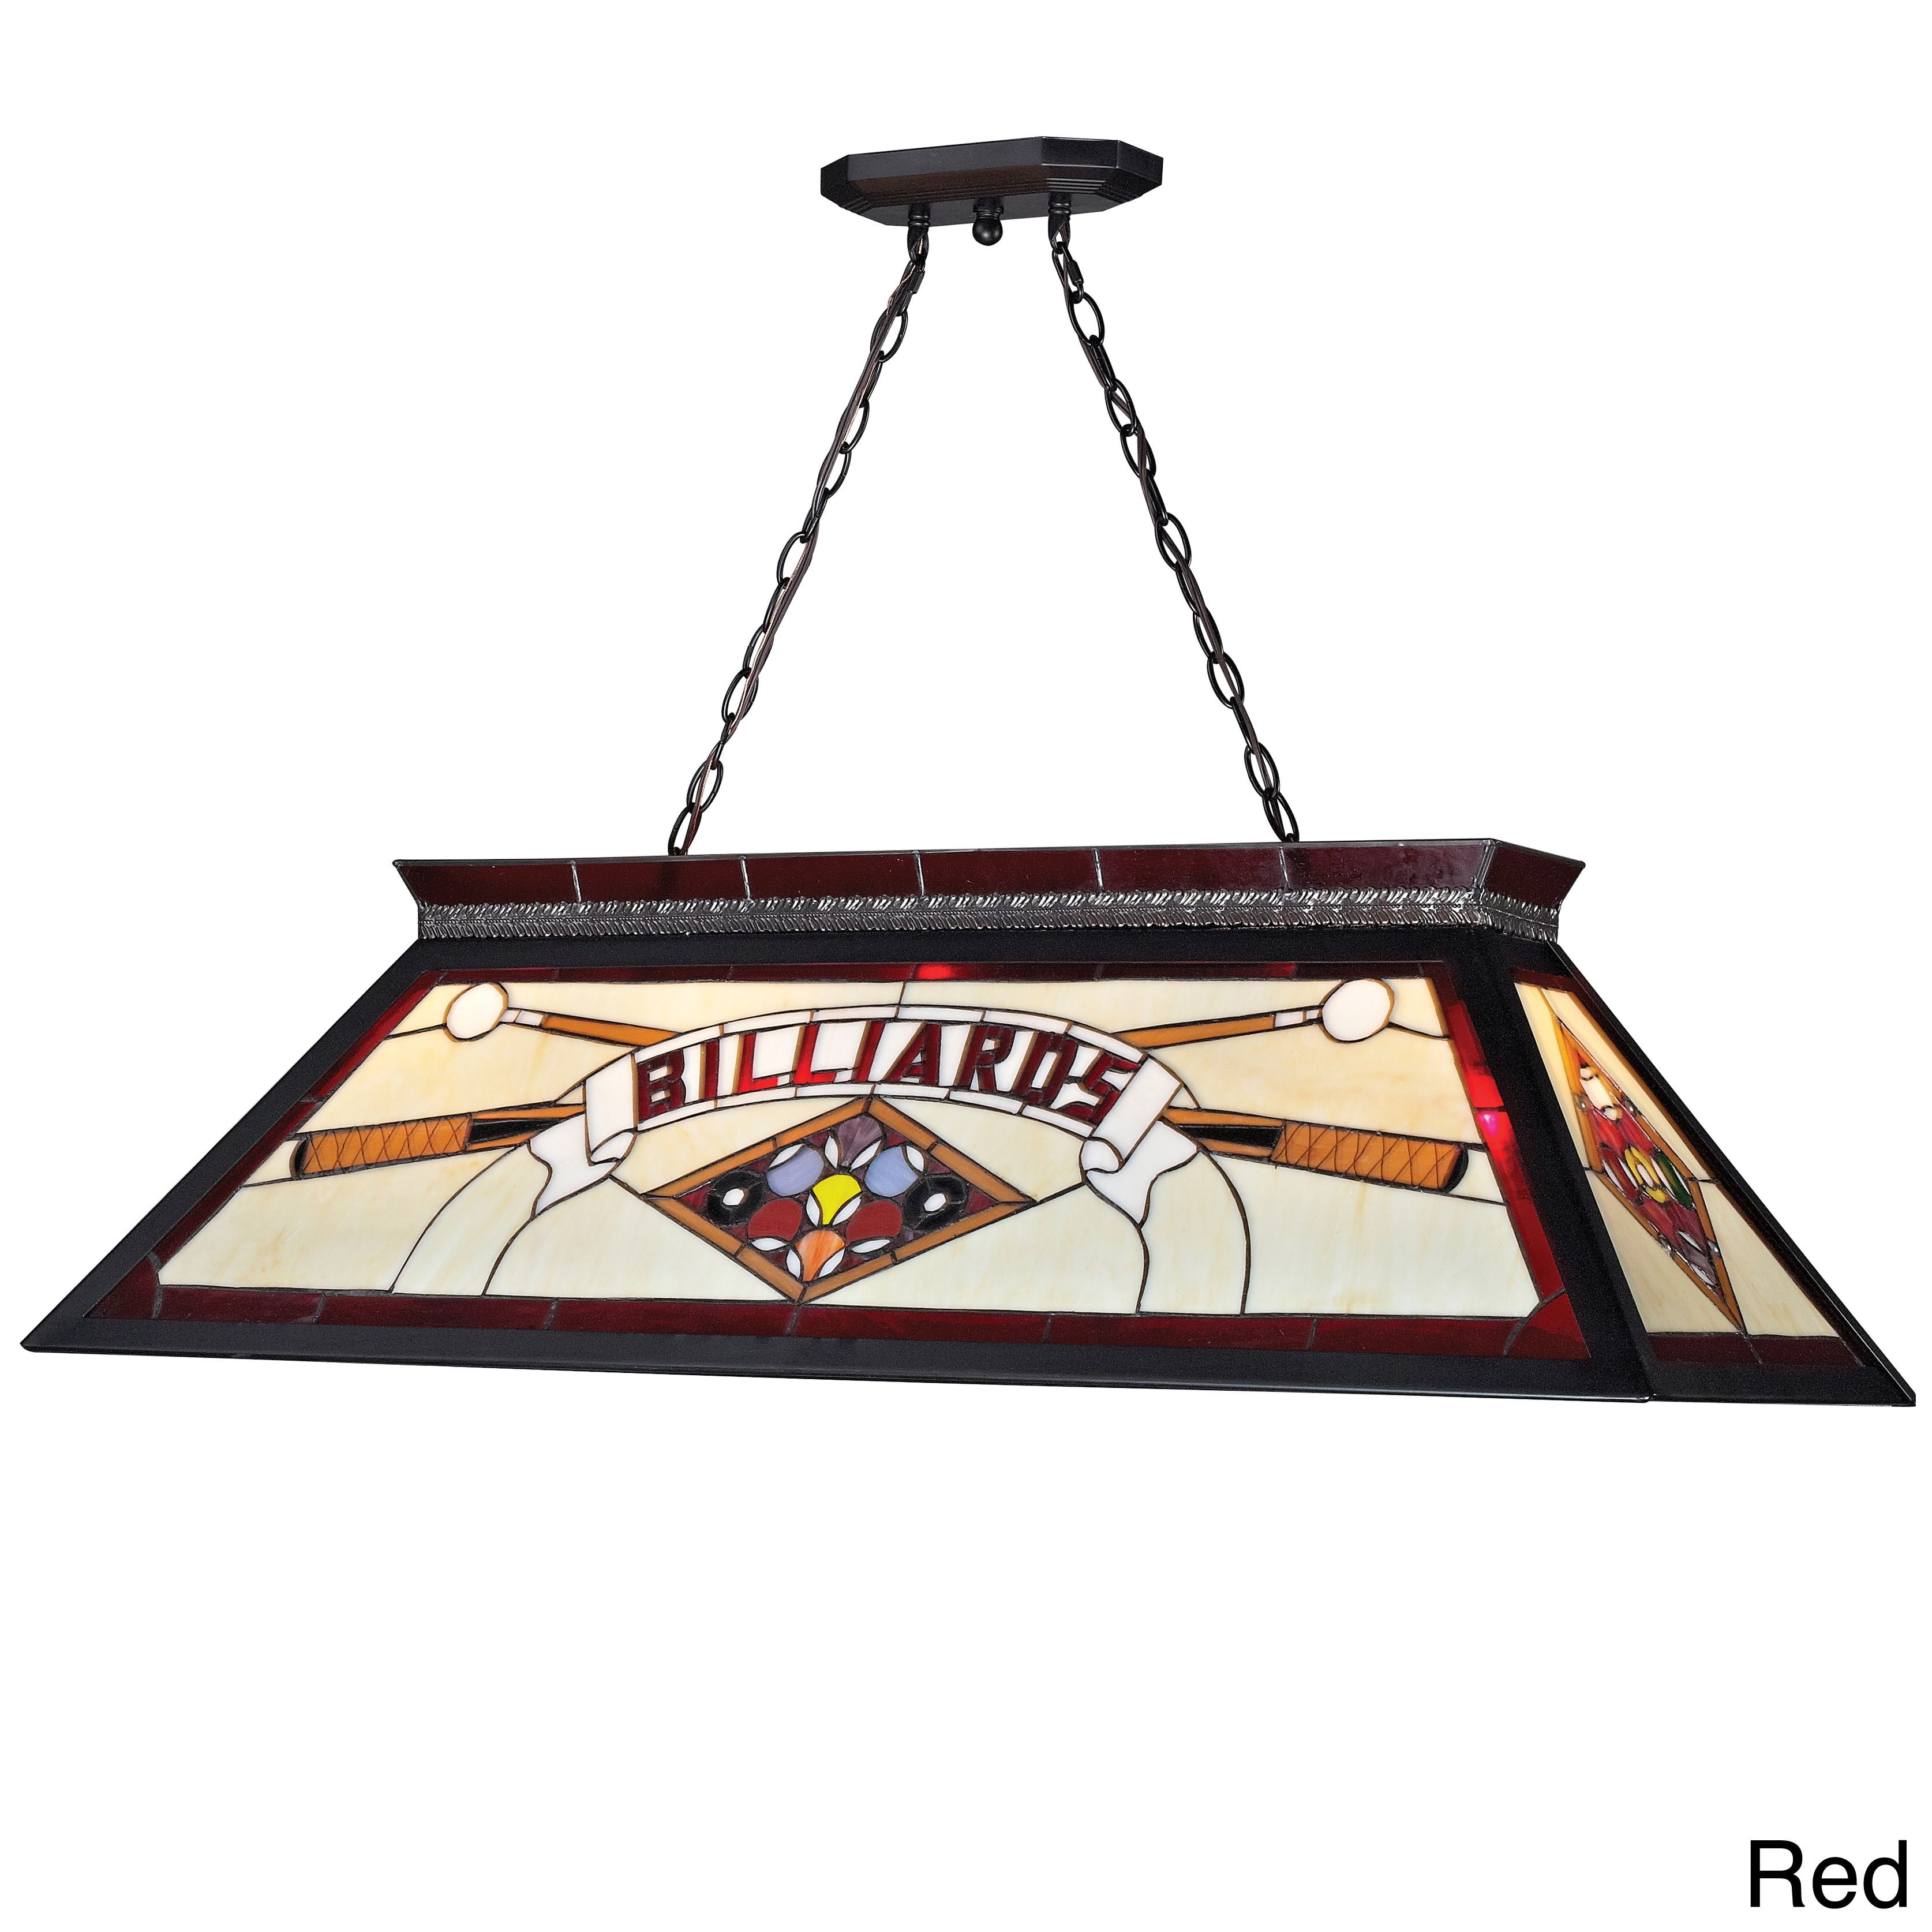 Z lite 4 light billiard light green billiard lights billiard z lite 4 light billiard light red billiard table lights arubaitofo Choice Image